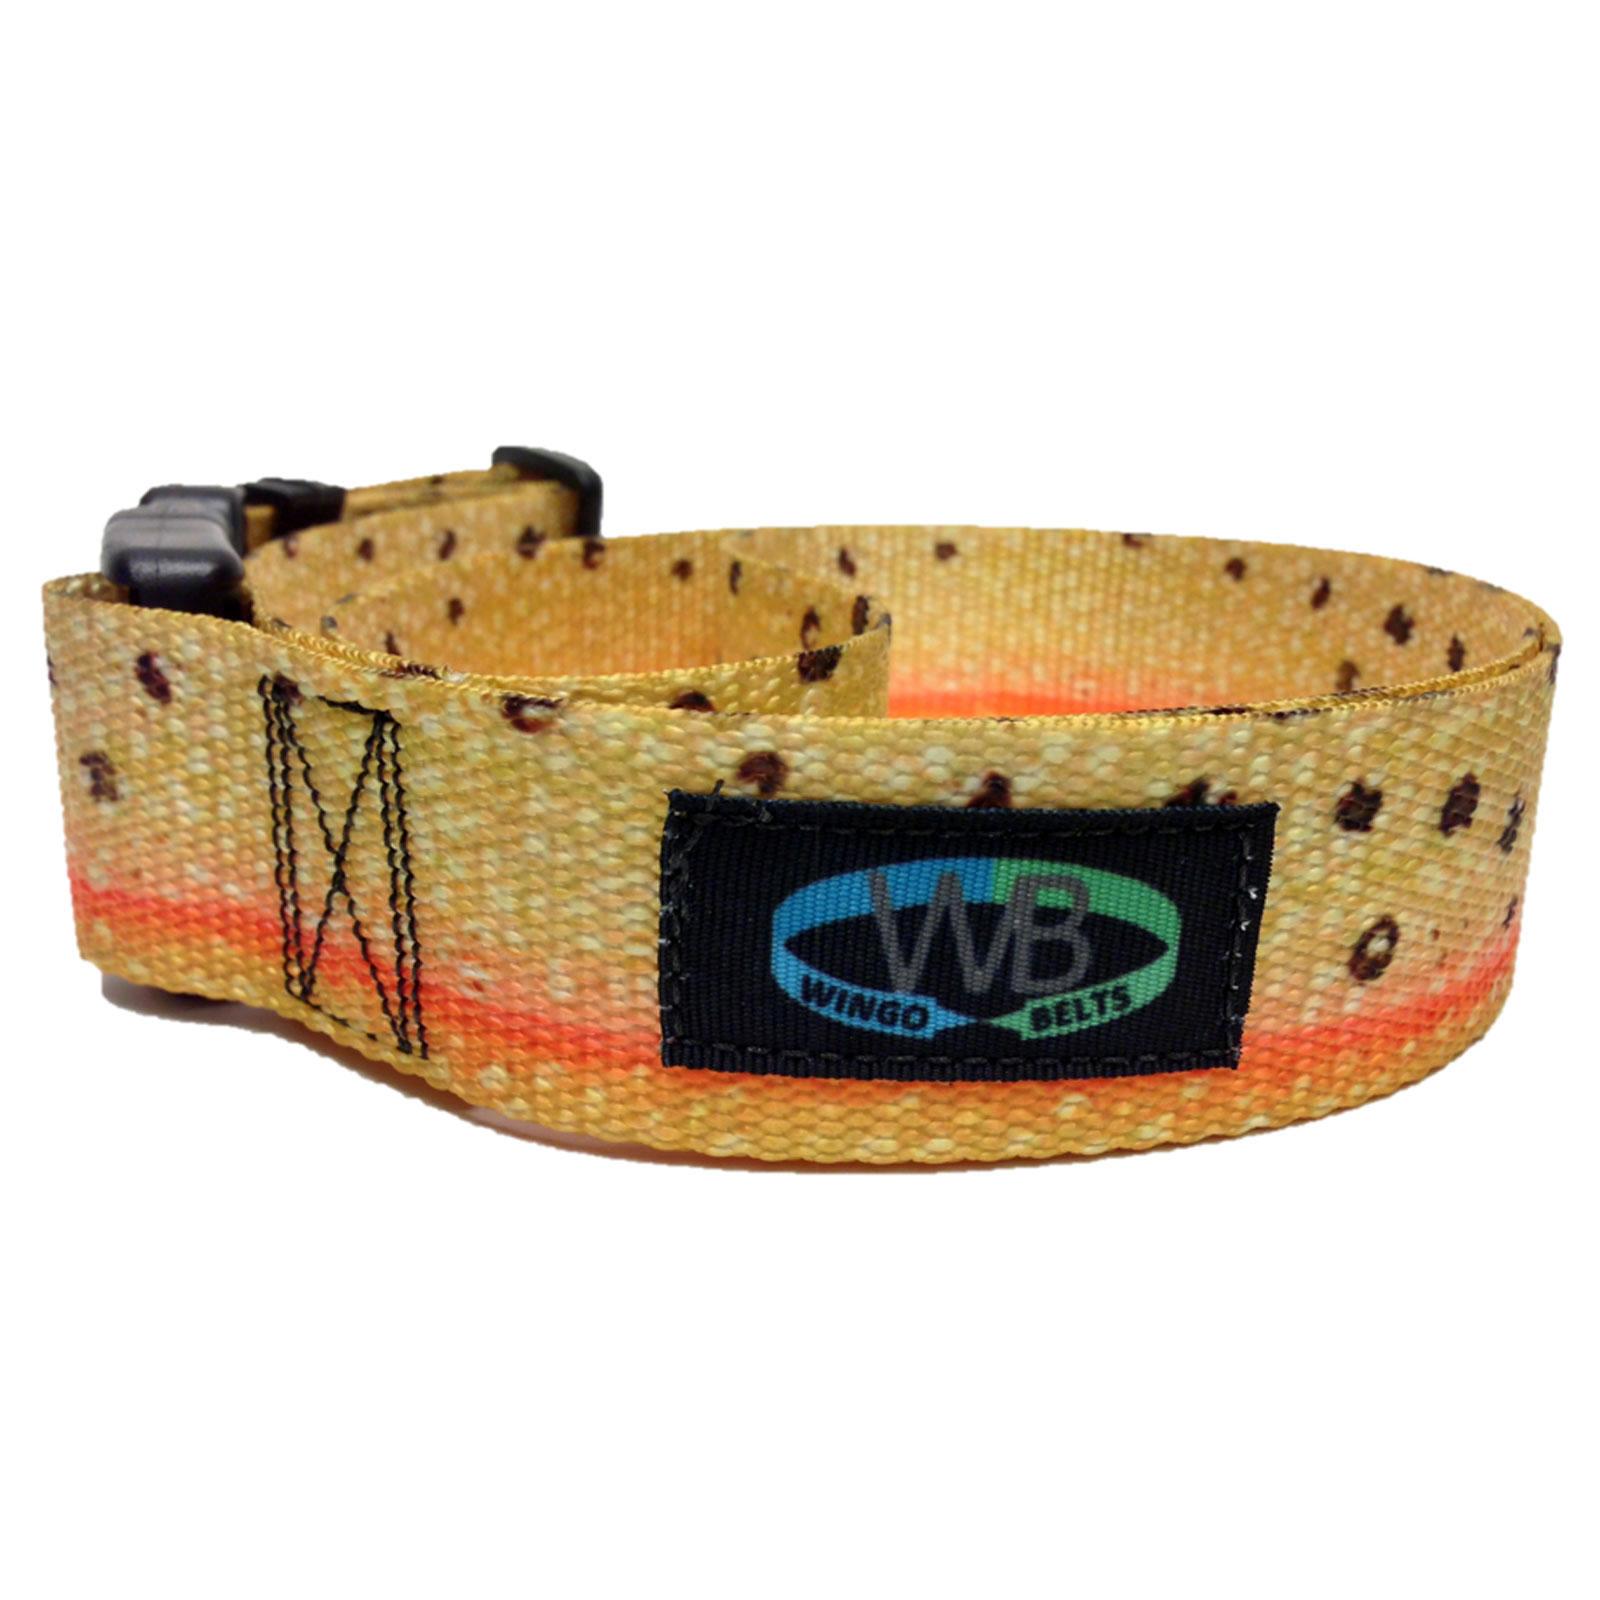 Wingo belts wading belts artisan durable adjustable for Wade fishing gear